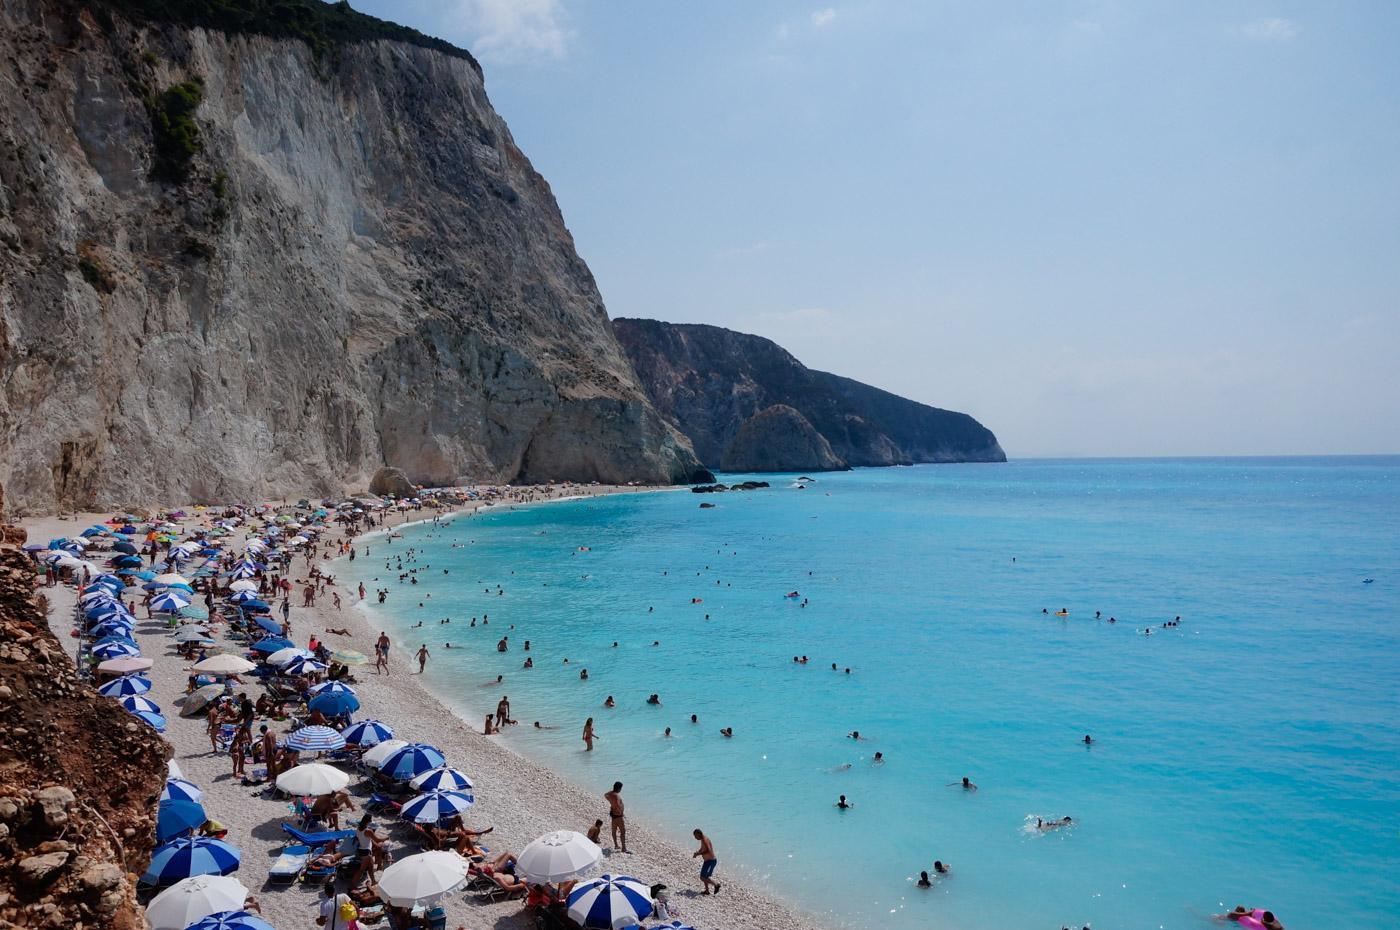 Lefkas leukste eiland griekenland